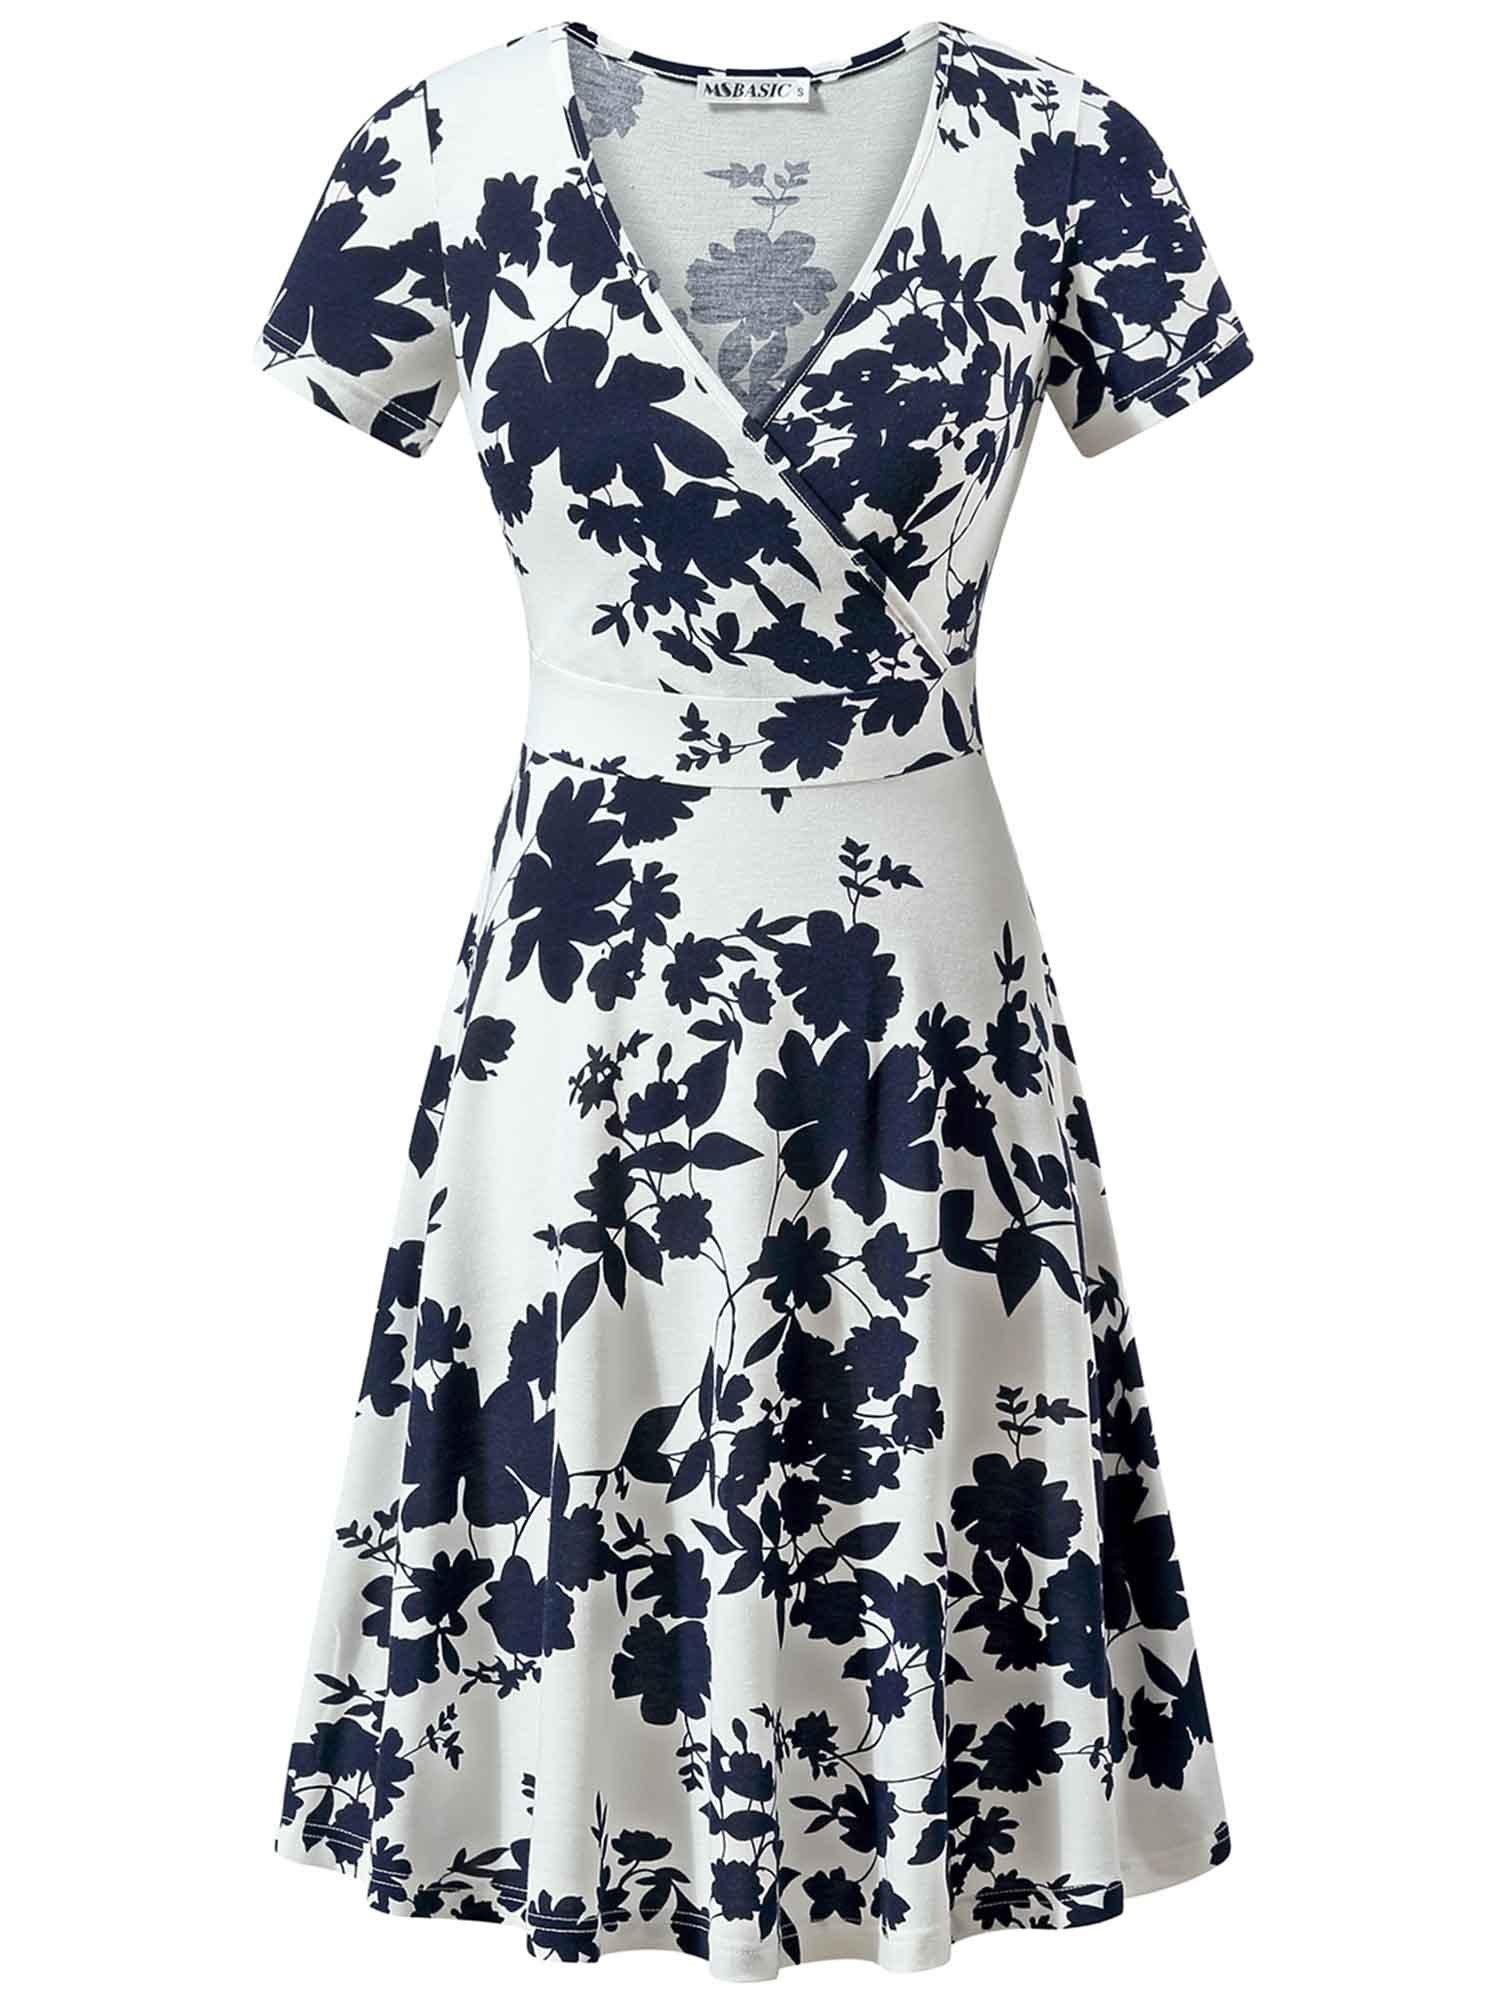 MSBASIC Flare Sundress, Graduation Dress for Juniors Navy Flowers XL